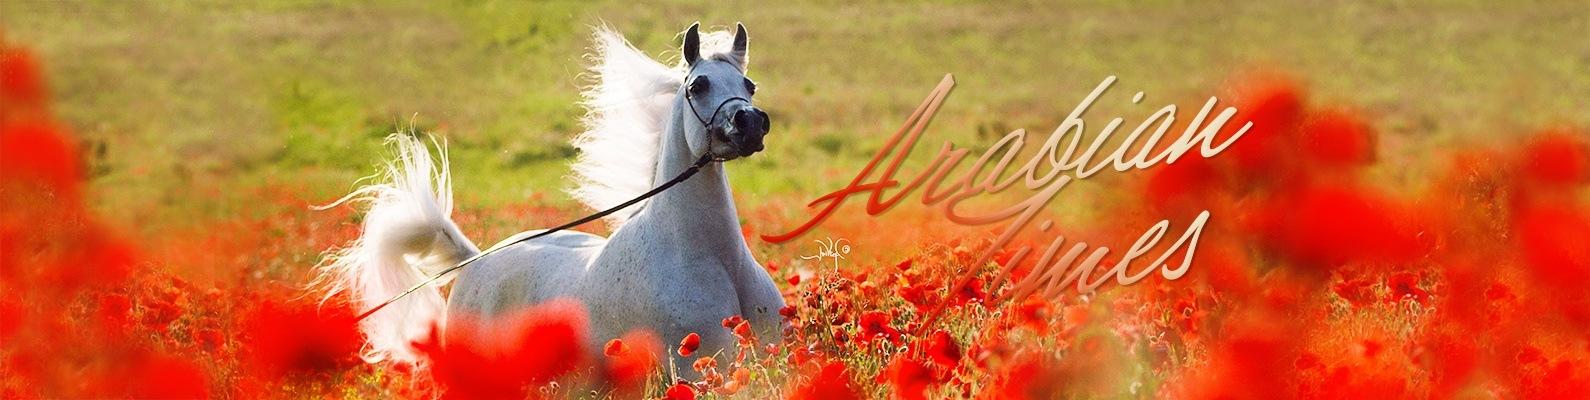 171 Arabian Times арабские лошади Vk